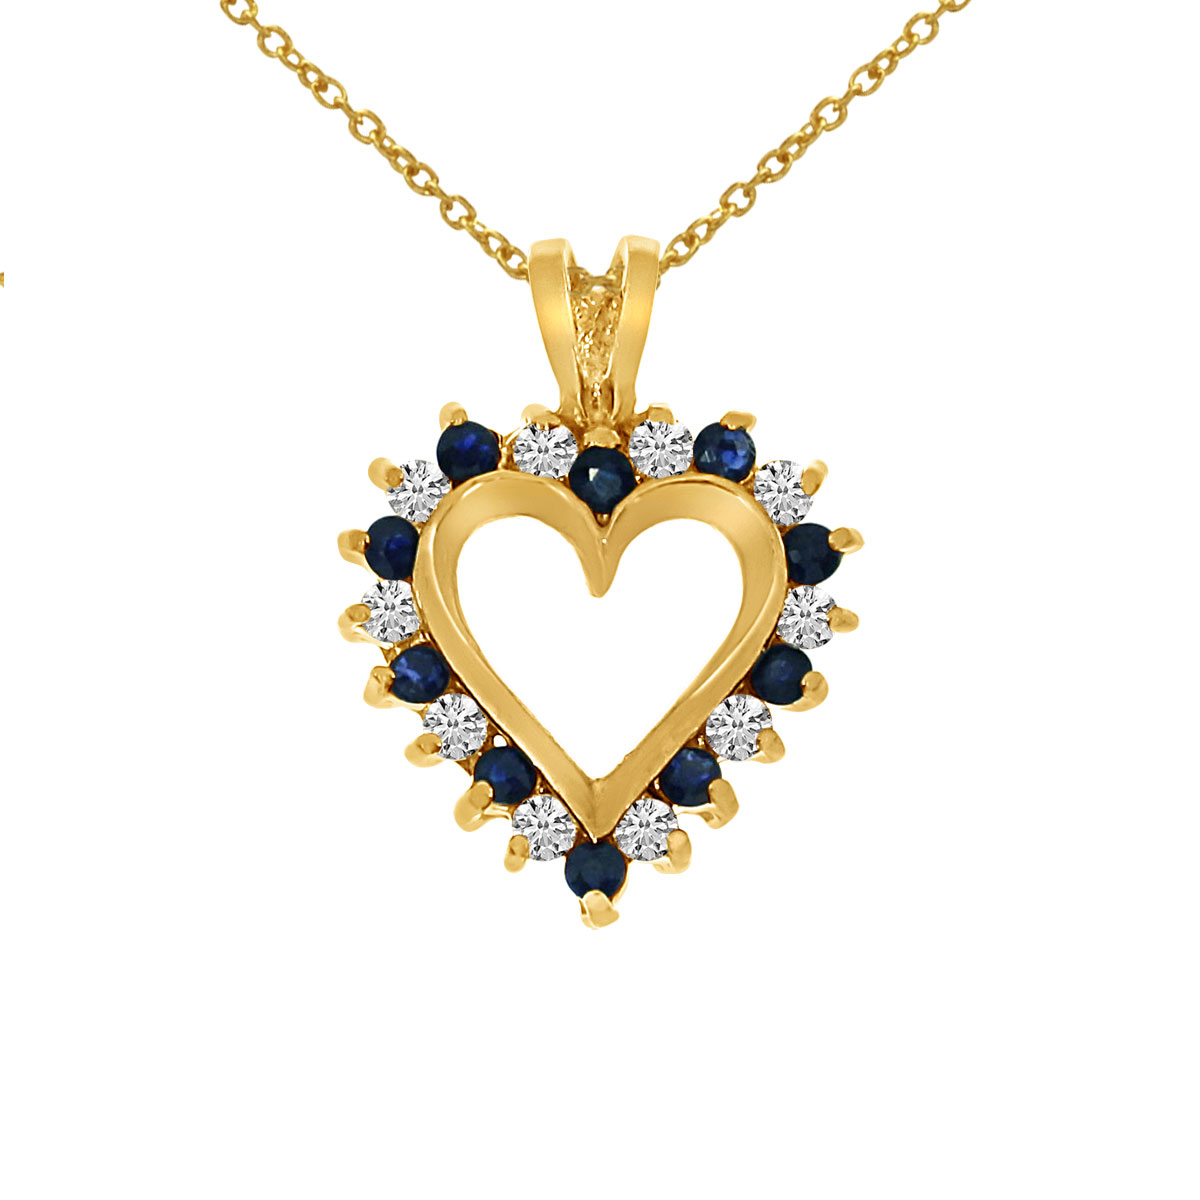 14k Yellow Gold Sapphire and Diamond Heart Shaped Pendant